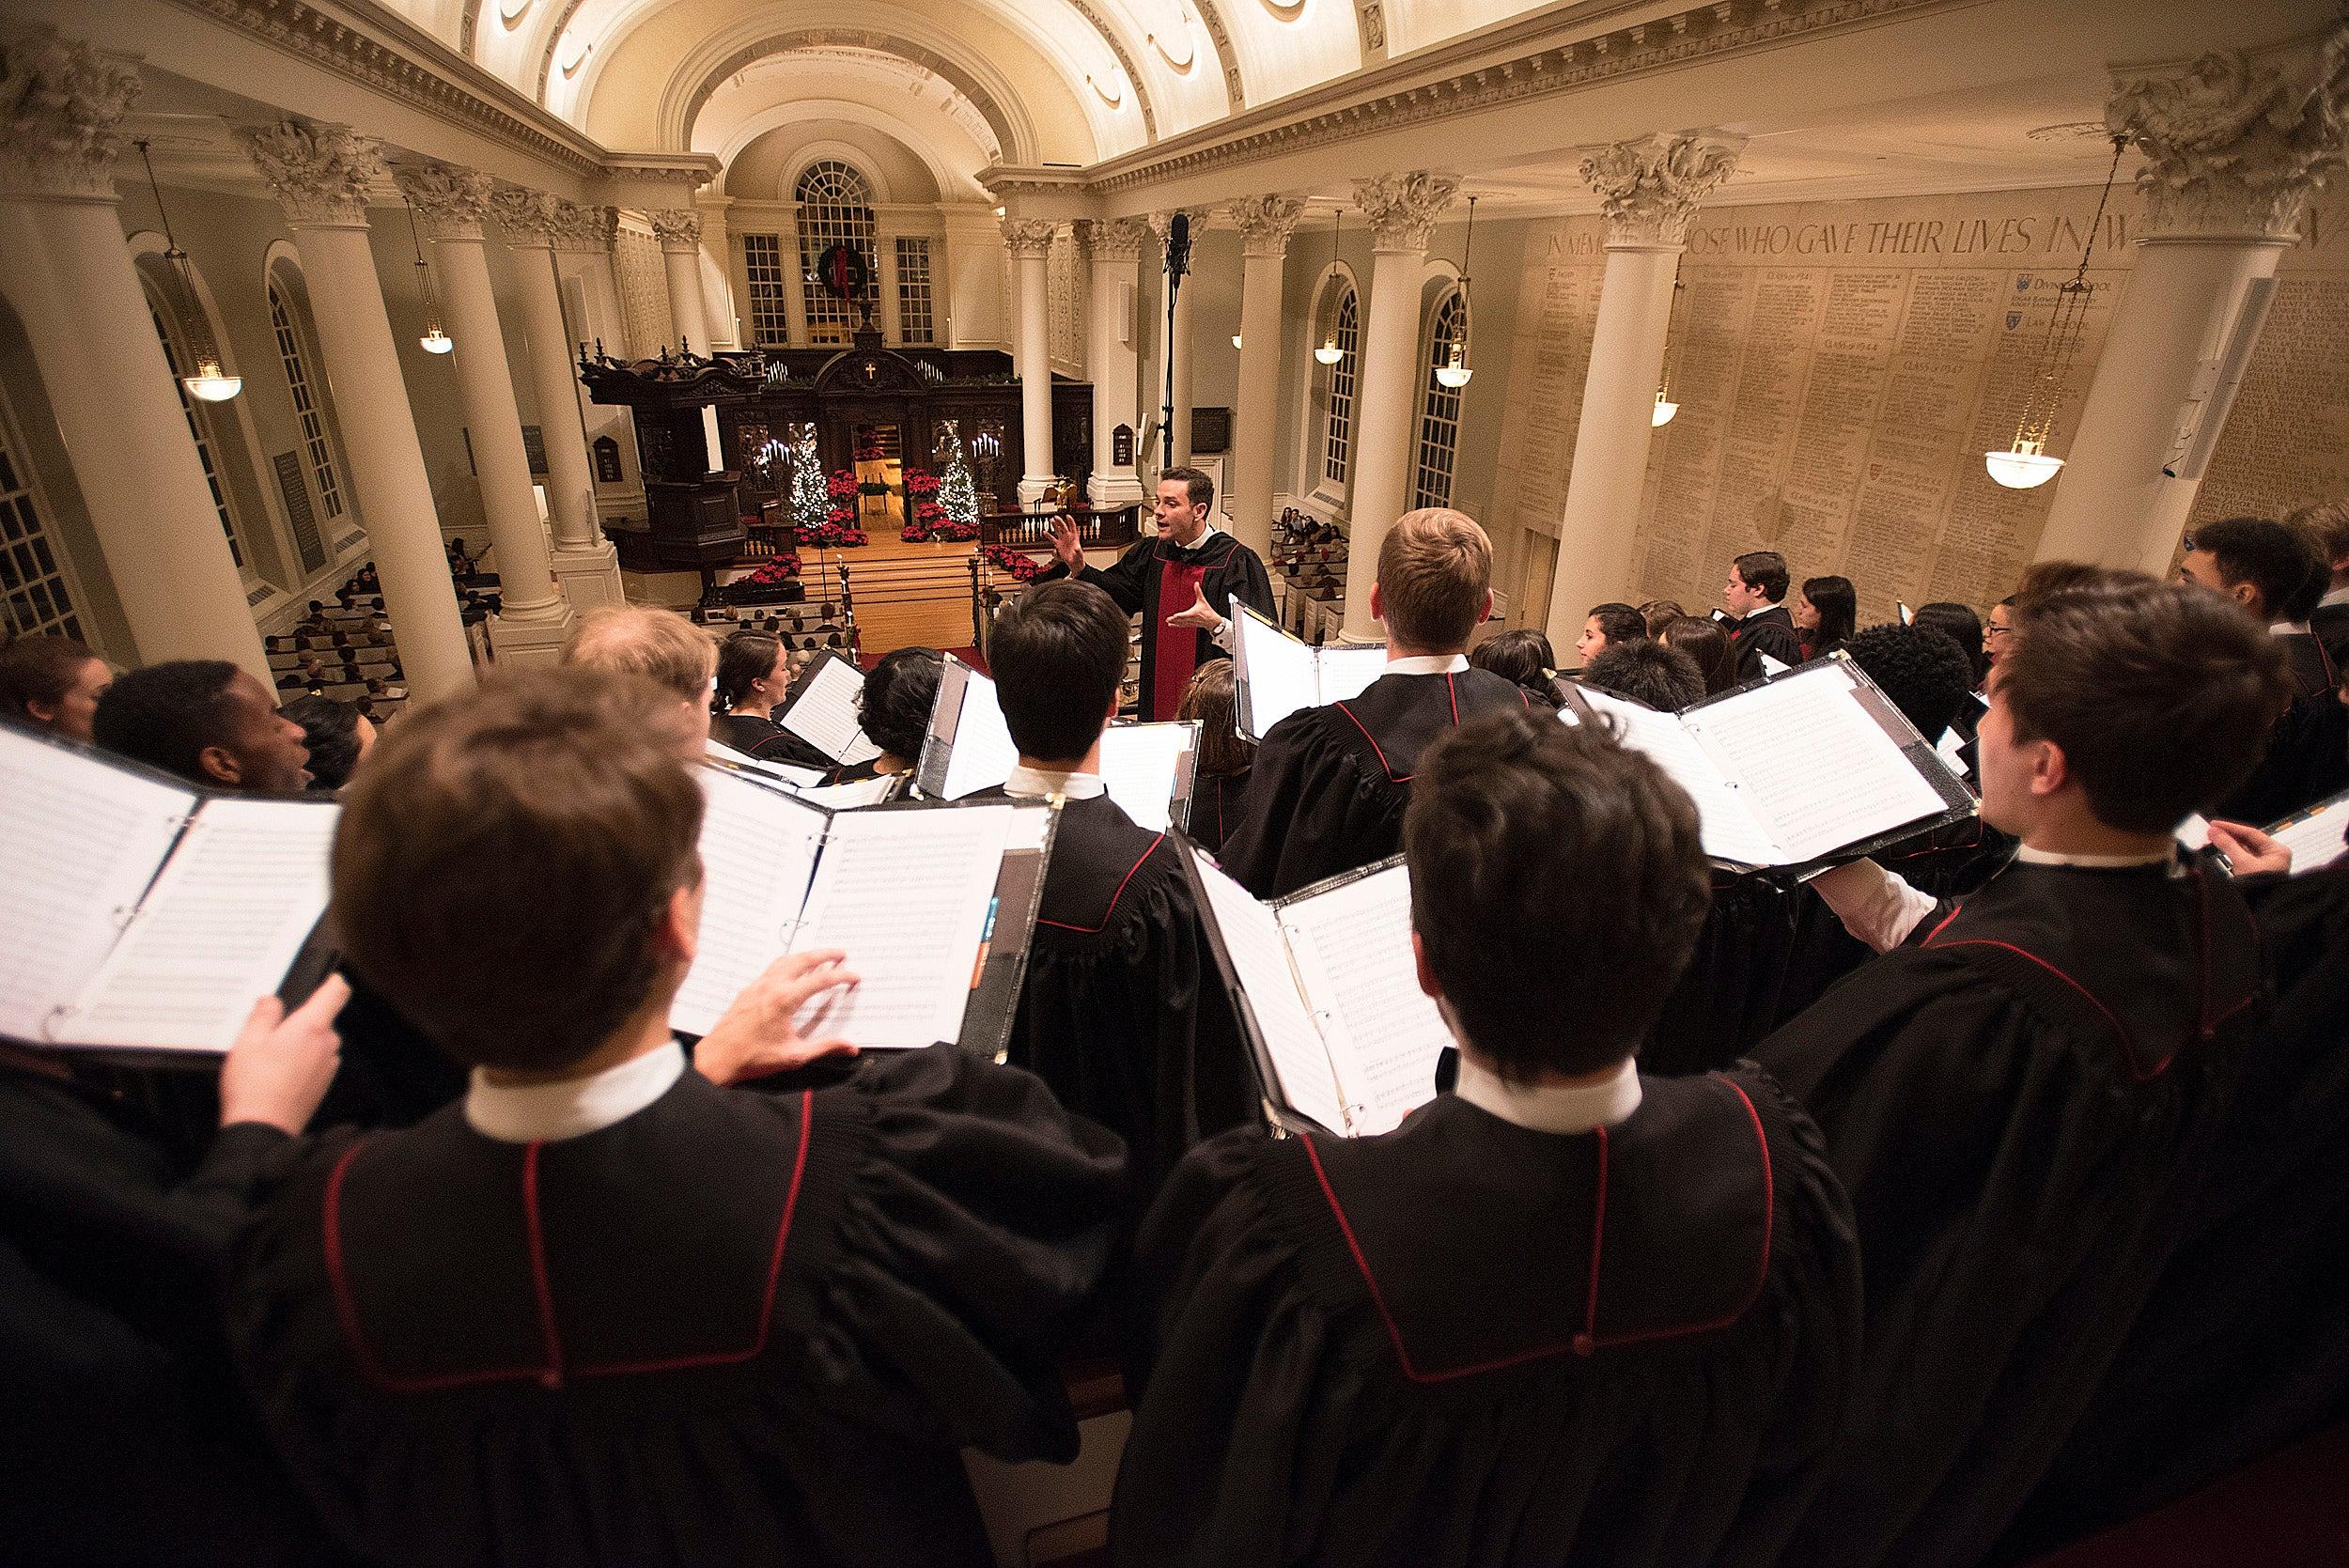 Choirmaster conducts Harvard choir during Christmas service in Memorial Church.